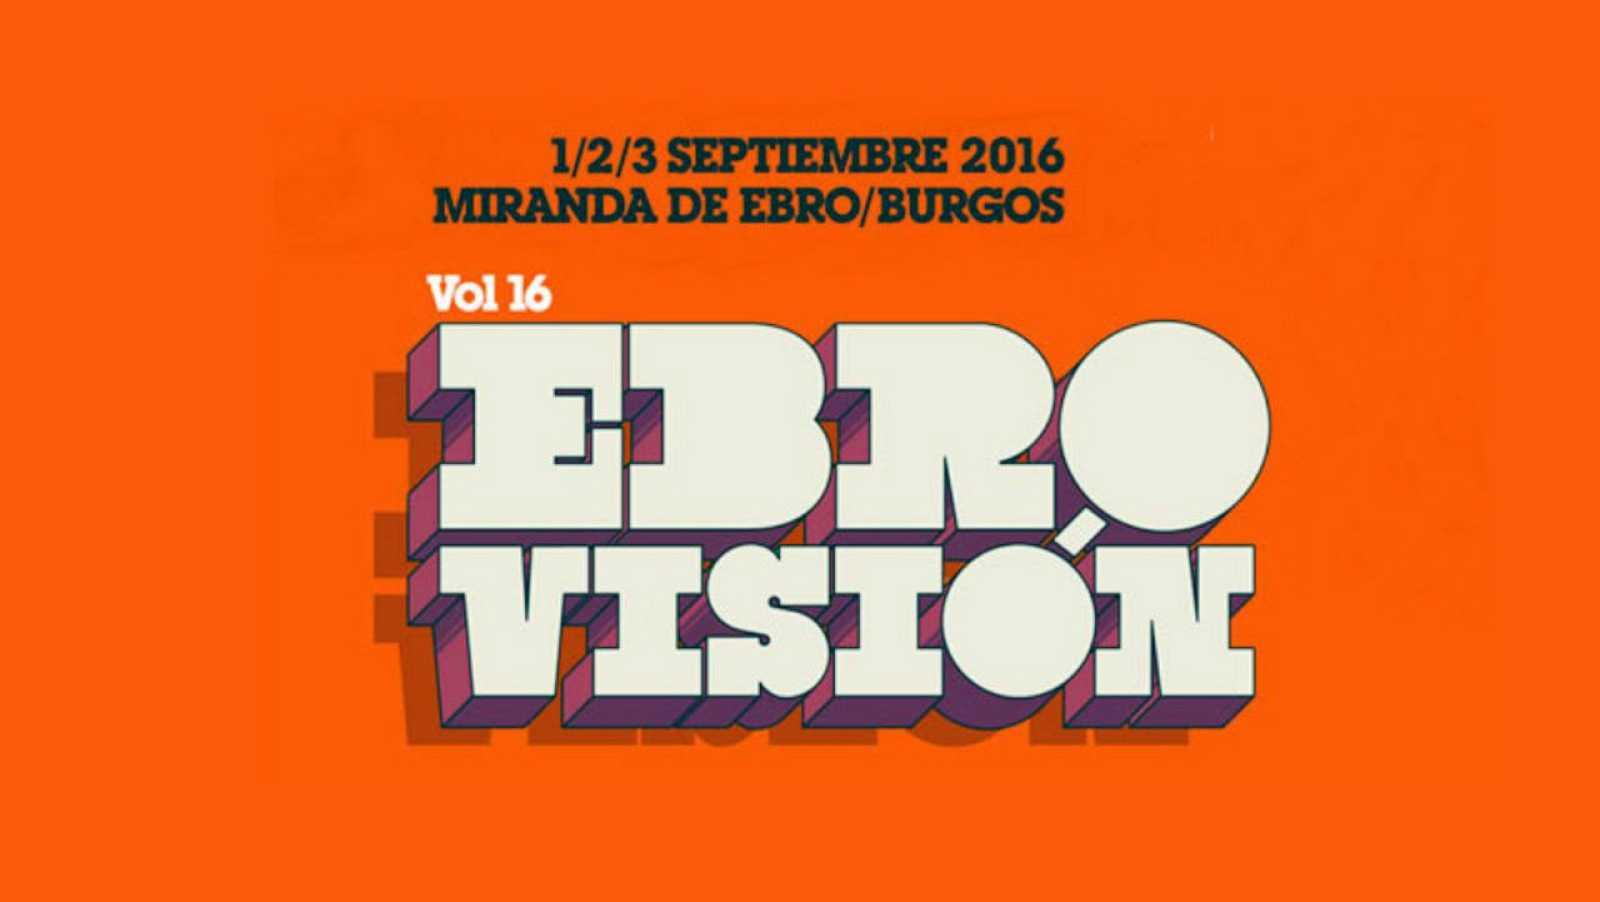 Ebrovisivos, tenéis una cita del 1 al 3 de septiembre